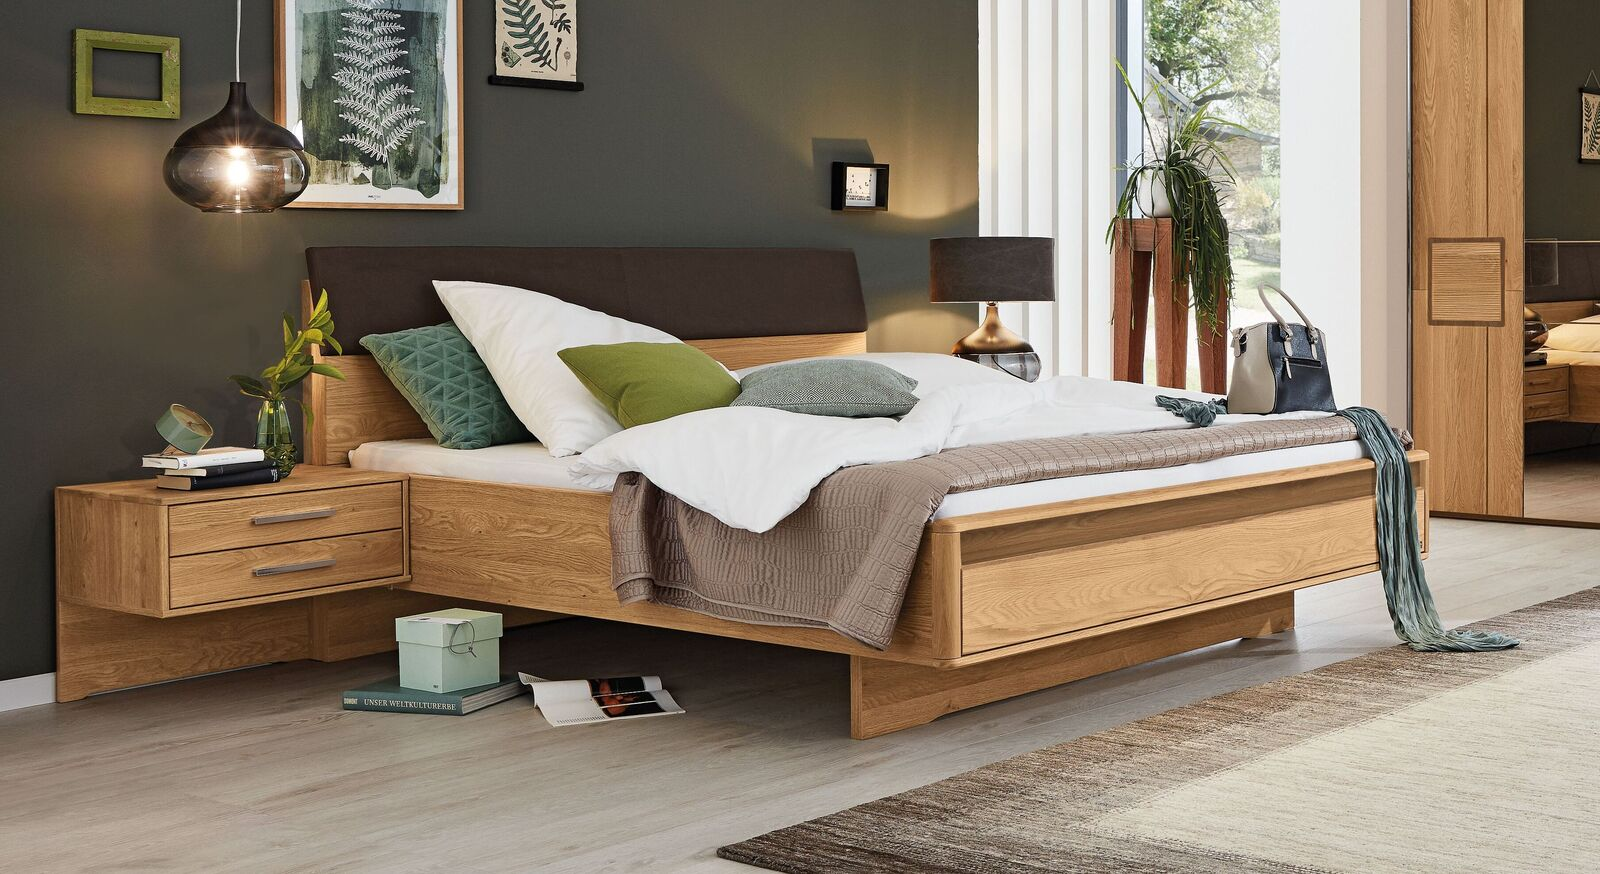 MUSTERRING Bett Samoa mit Quersockel aus massiver Eiche